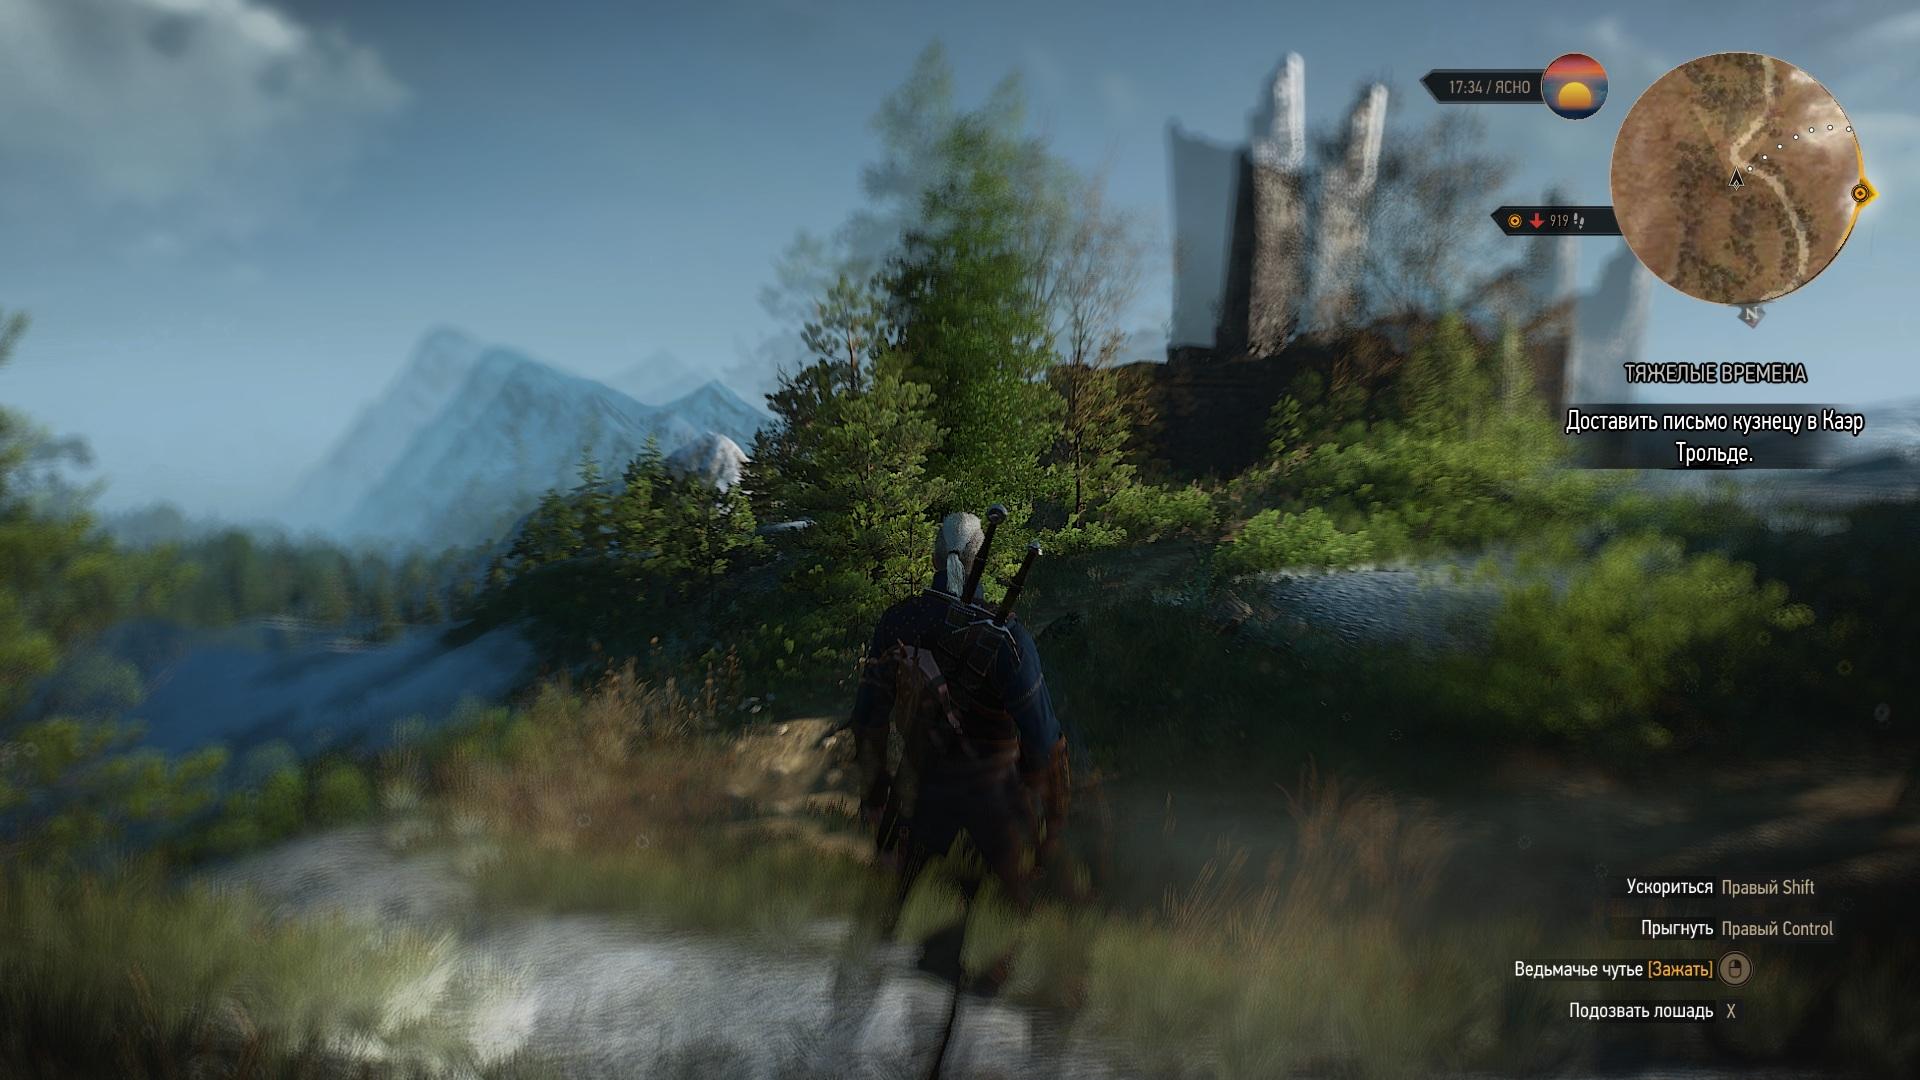 выпил бутылку боклерского.jpg - Witcher 3: Wild Hunt, the